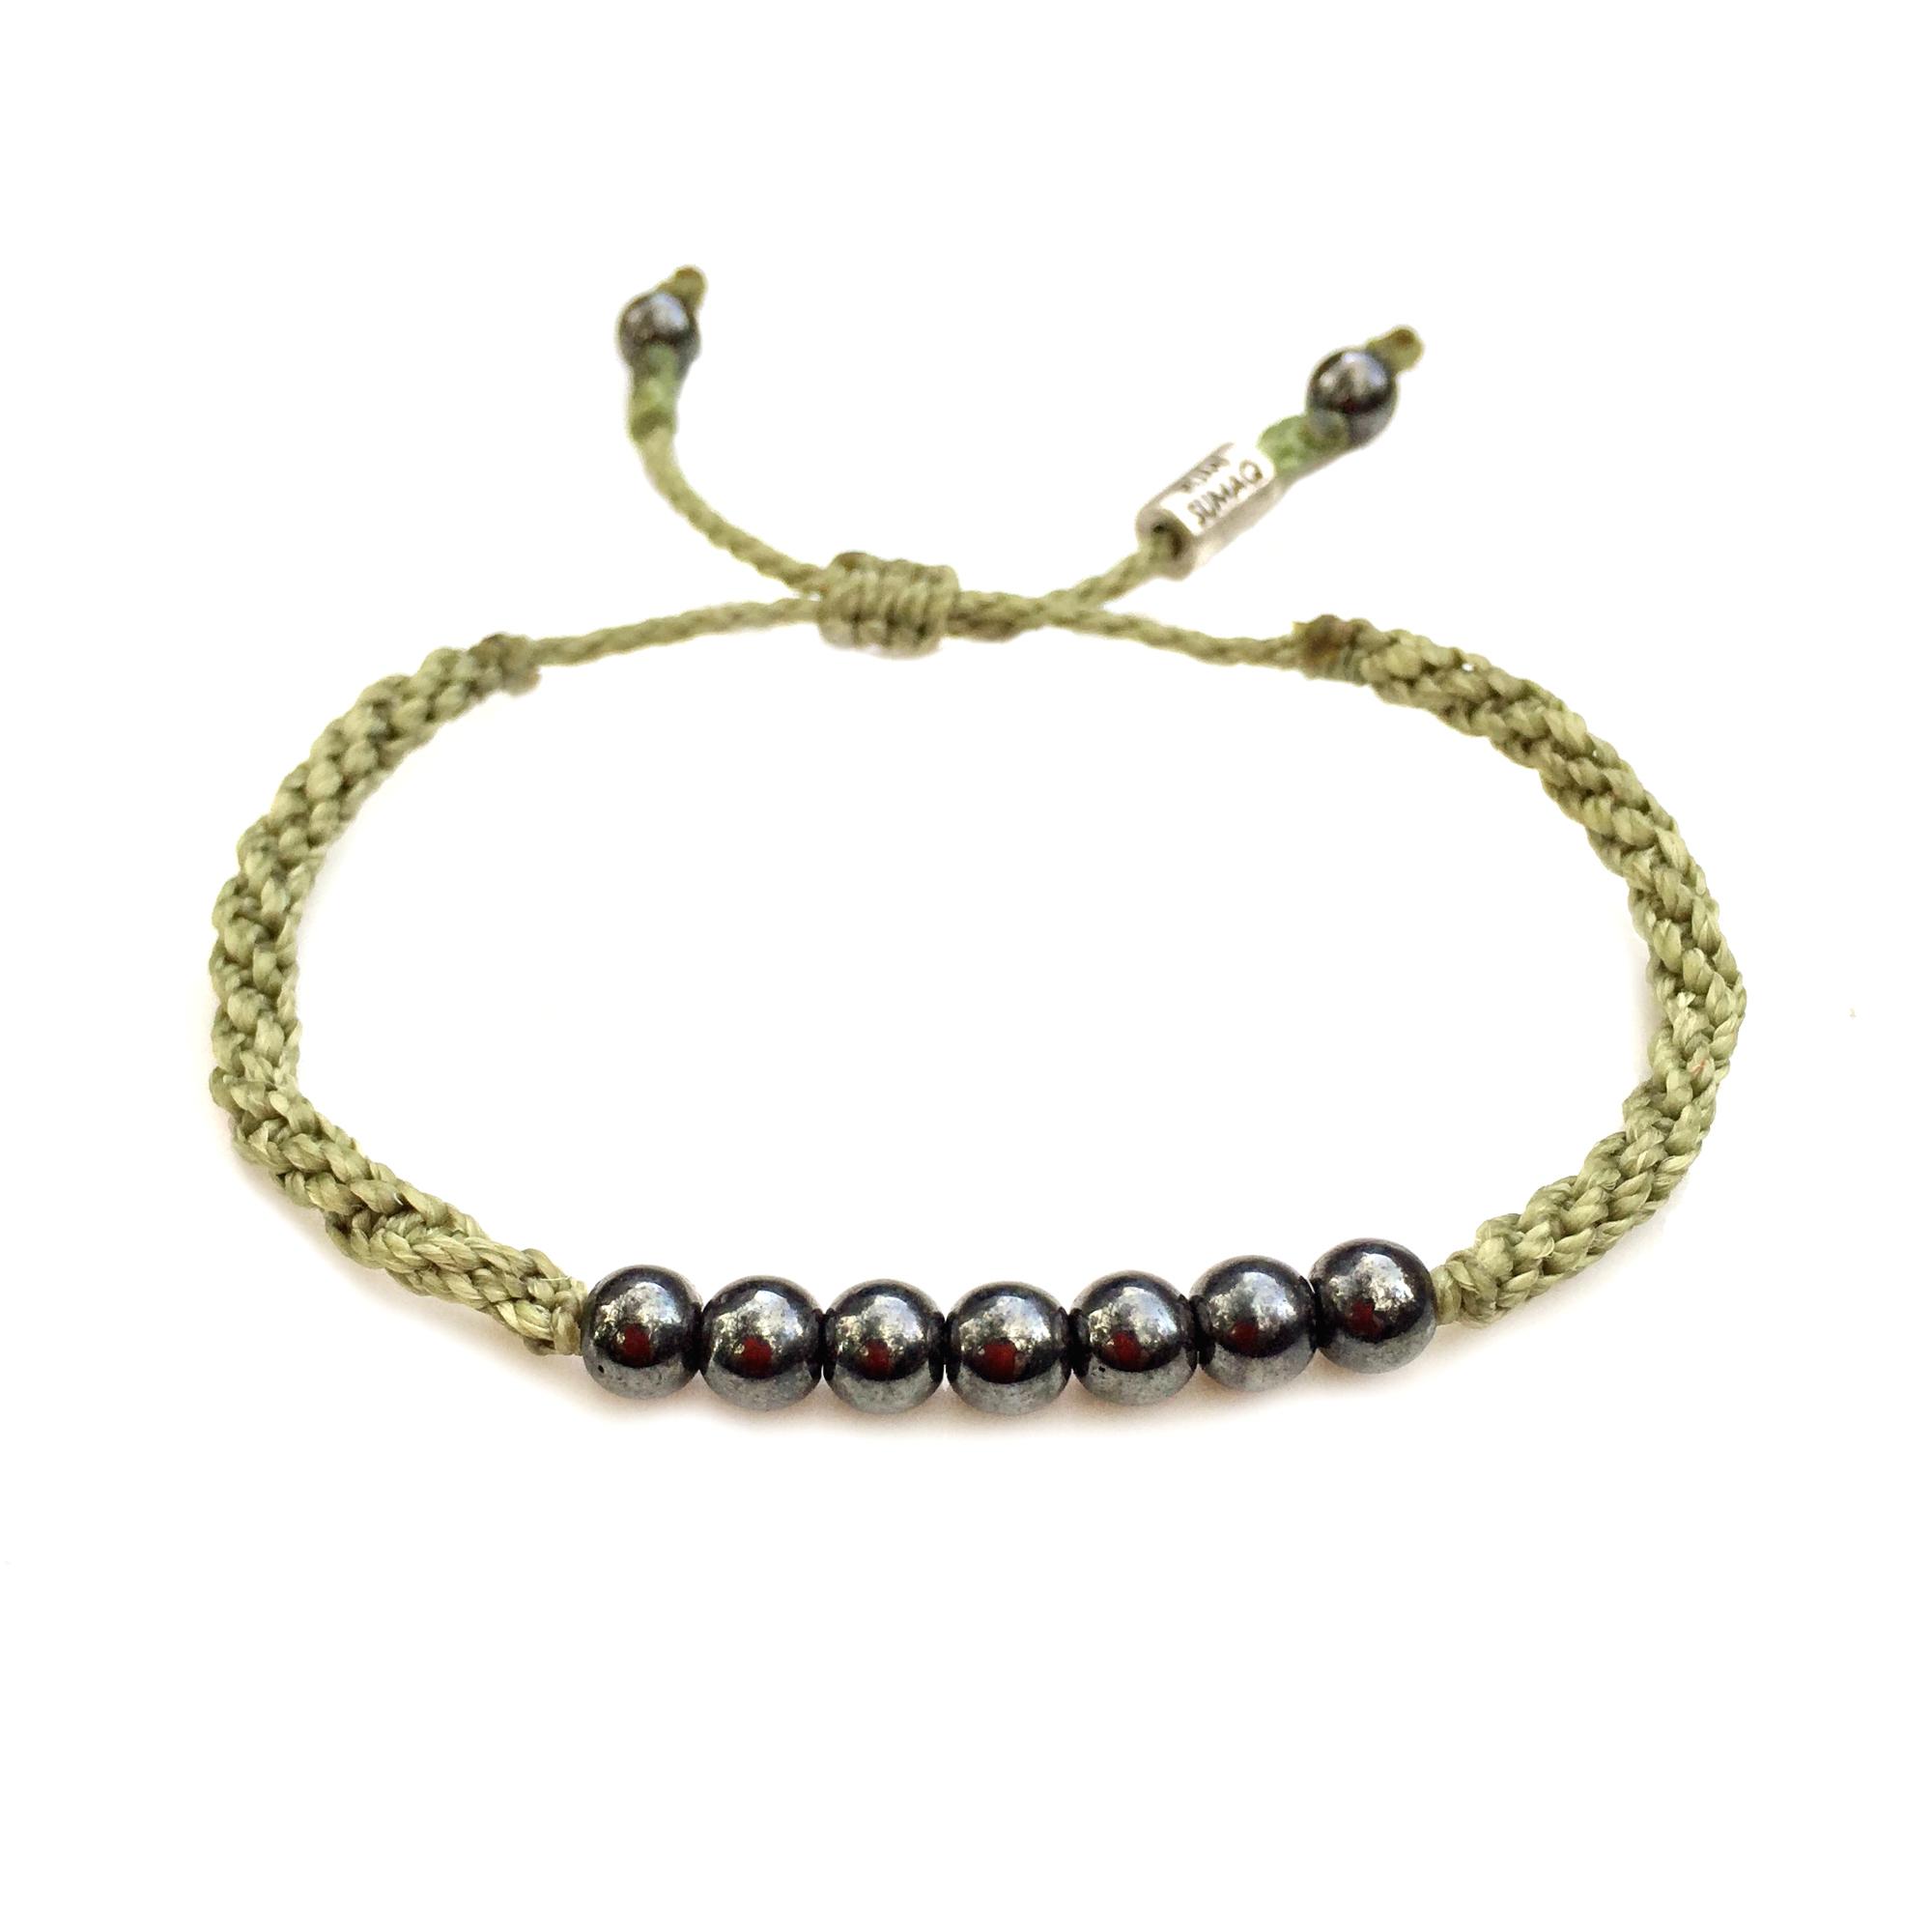 Rope Bracelet Sage Green with Hematite Stones: Rumi Sumaq Sailor and Surfer Bracelets Handmade on Martha's Vineyard